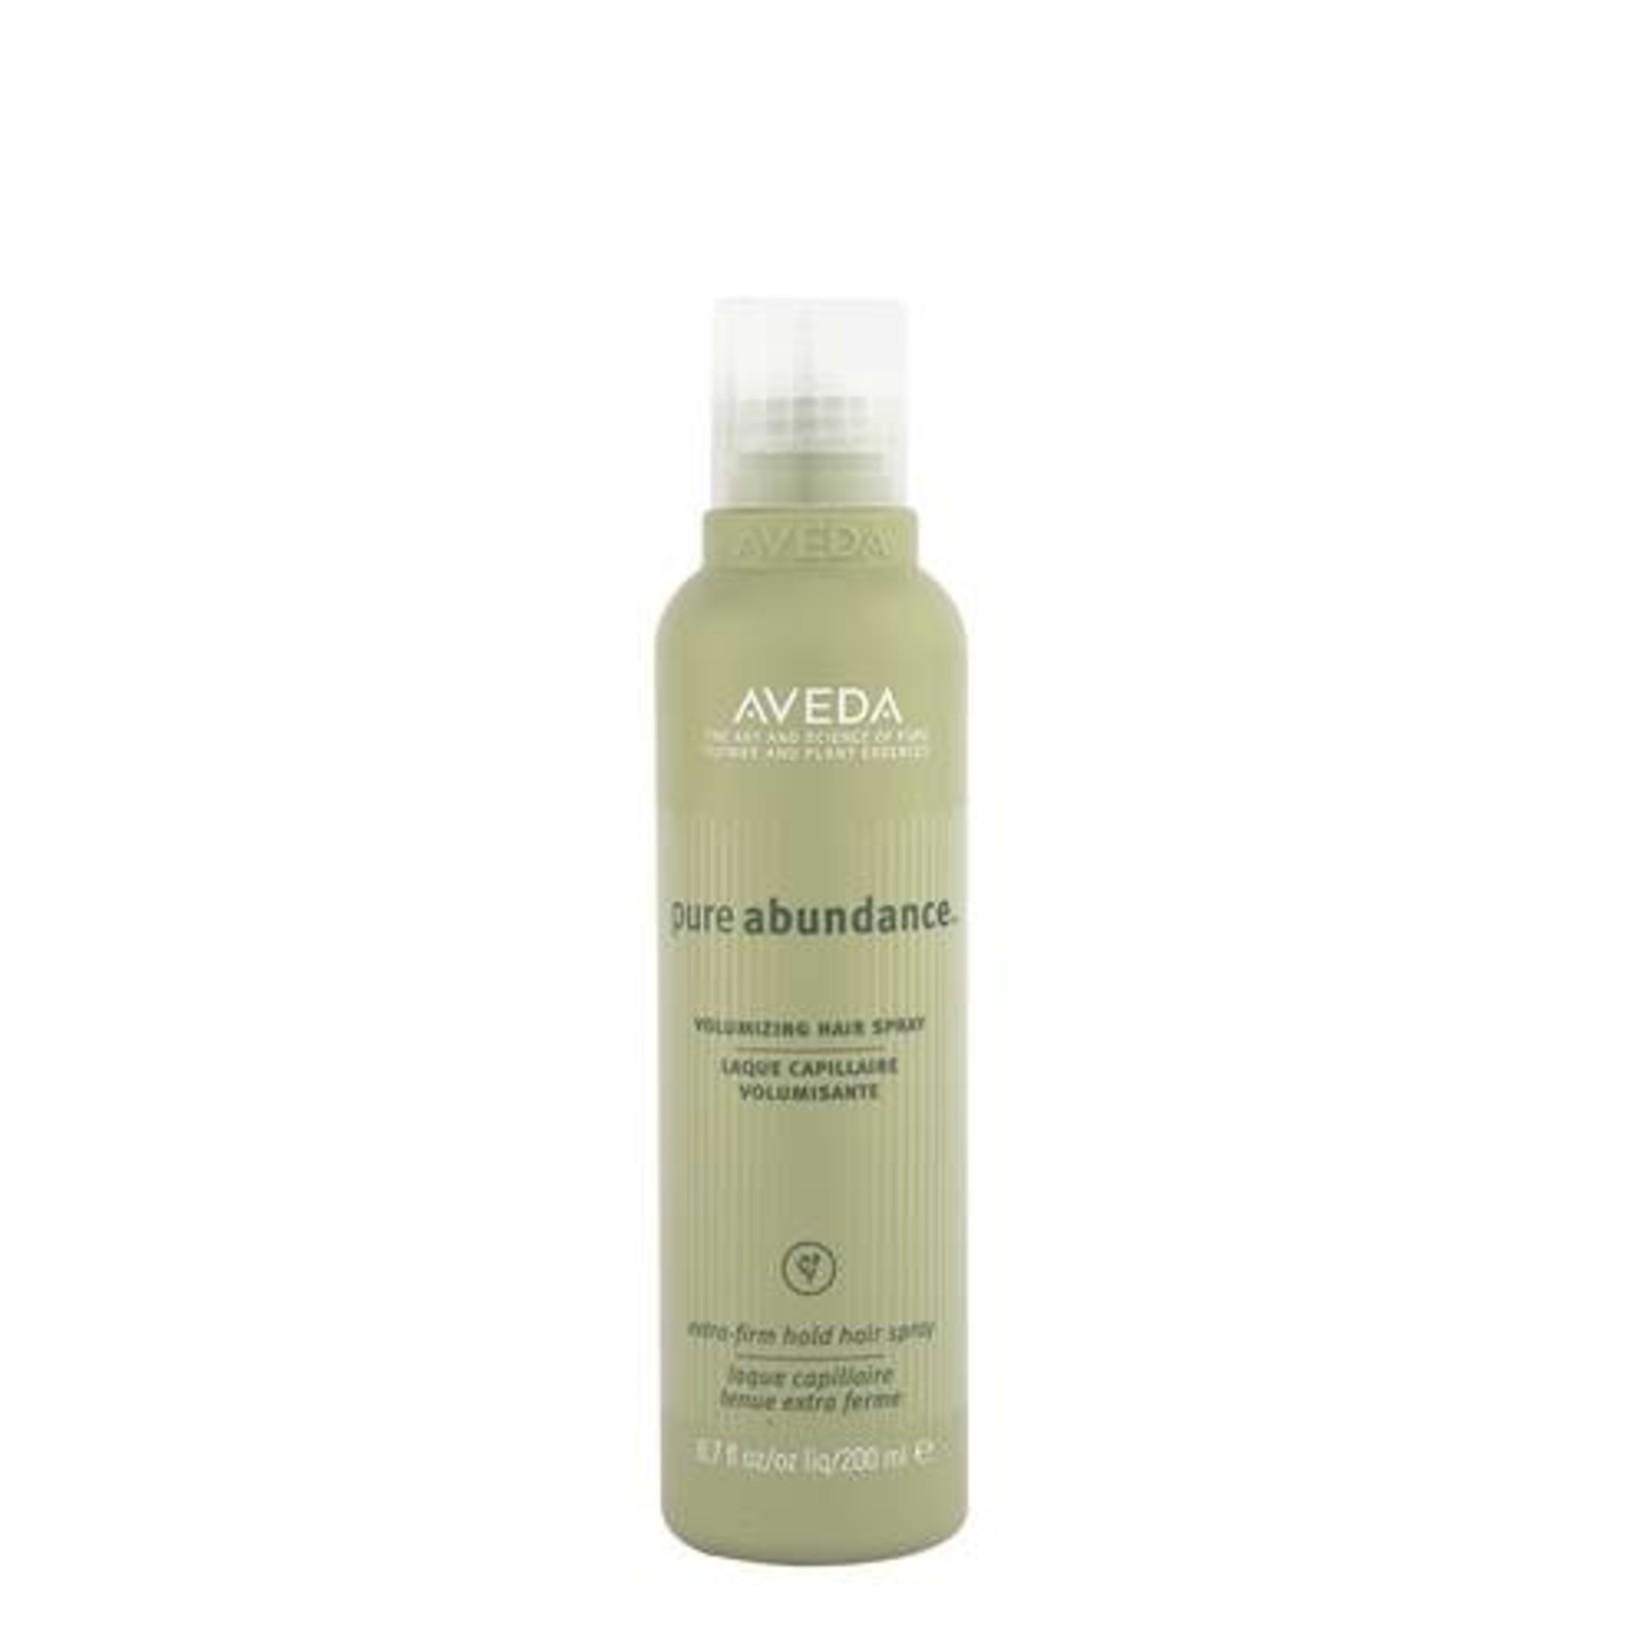 AVEDA Pure Abundance™ Volumizing Hair Spray